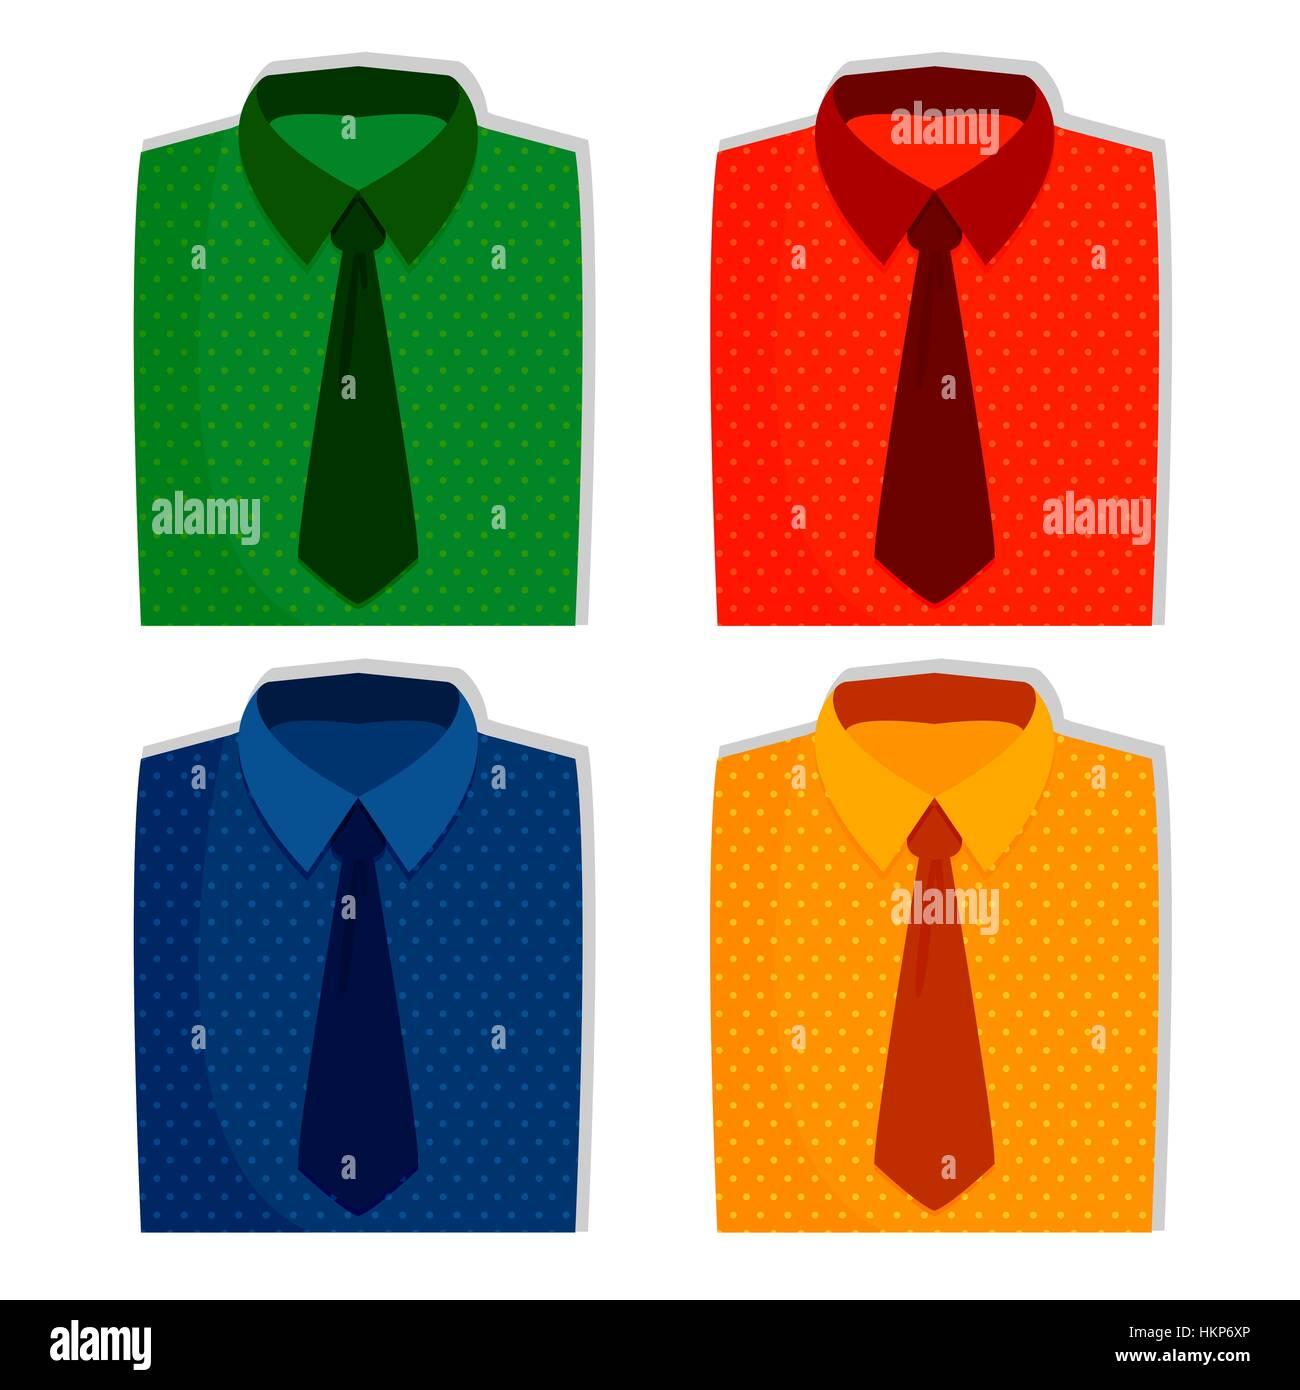 207babcc13d Shirts set, mens fashion illustration. Vector line icons of folded ...